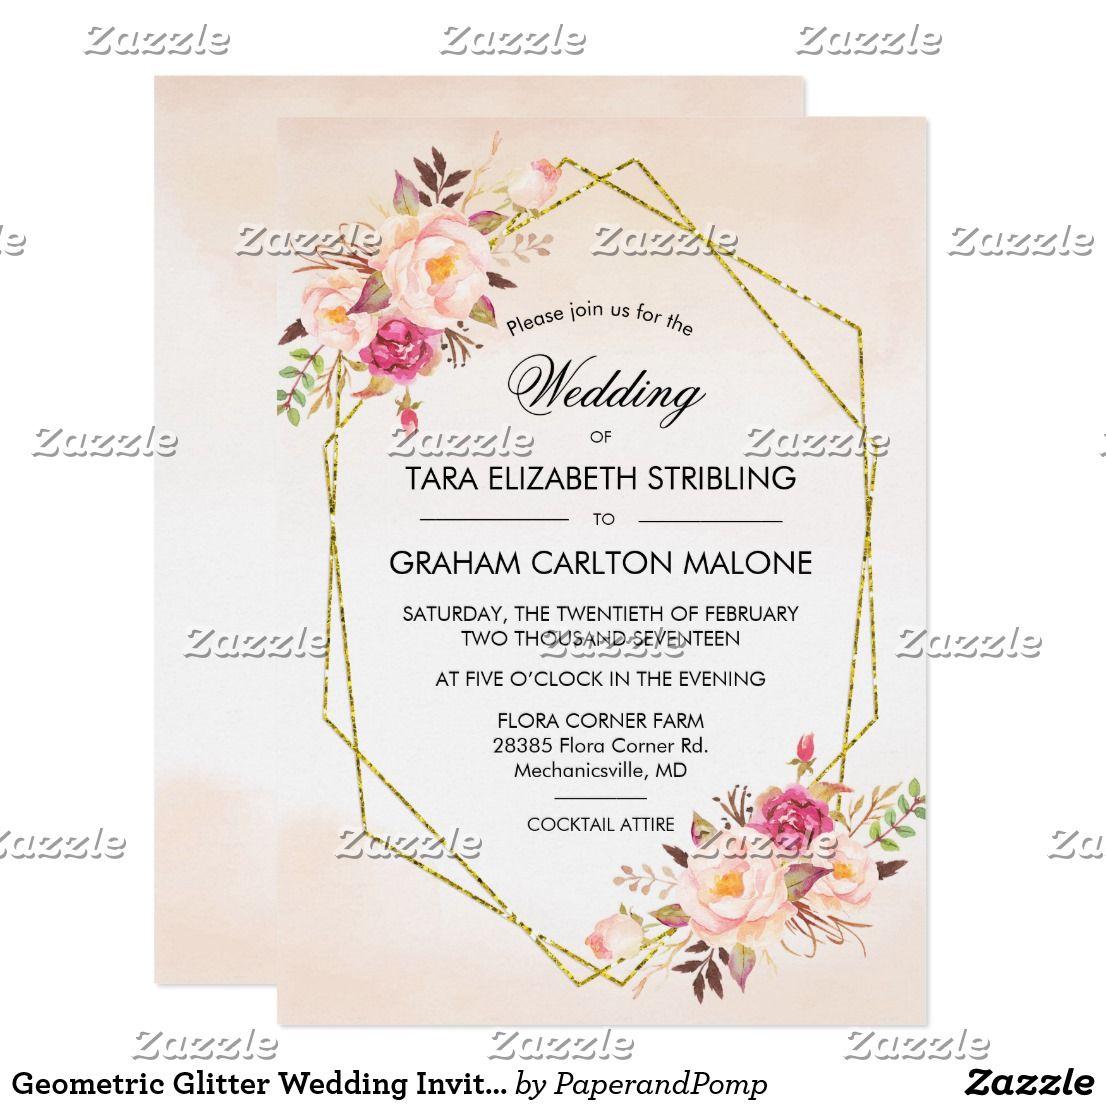 Geometric Glitter Wedding Invitation Zazzle Com Glitter Wedding Invitations Glitter Baby Shower Invitations Glitter Baby Shower